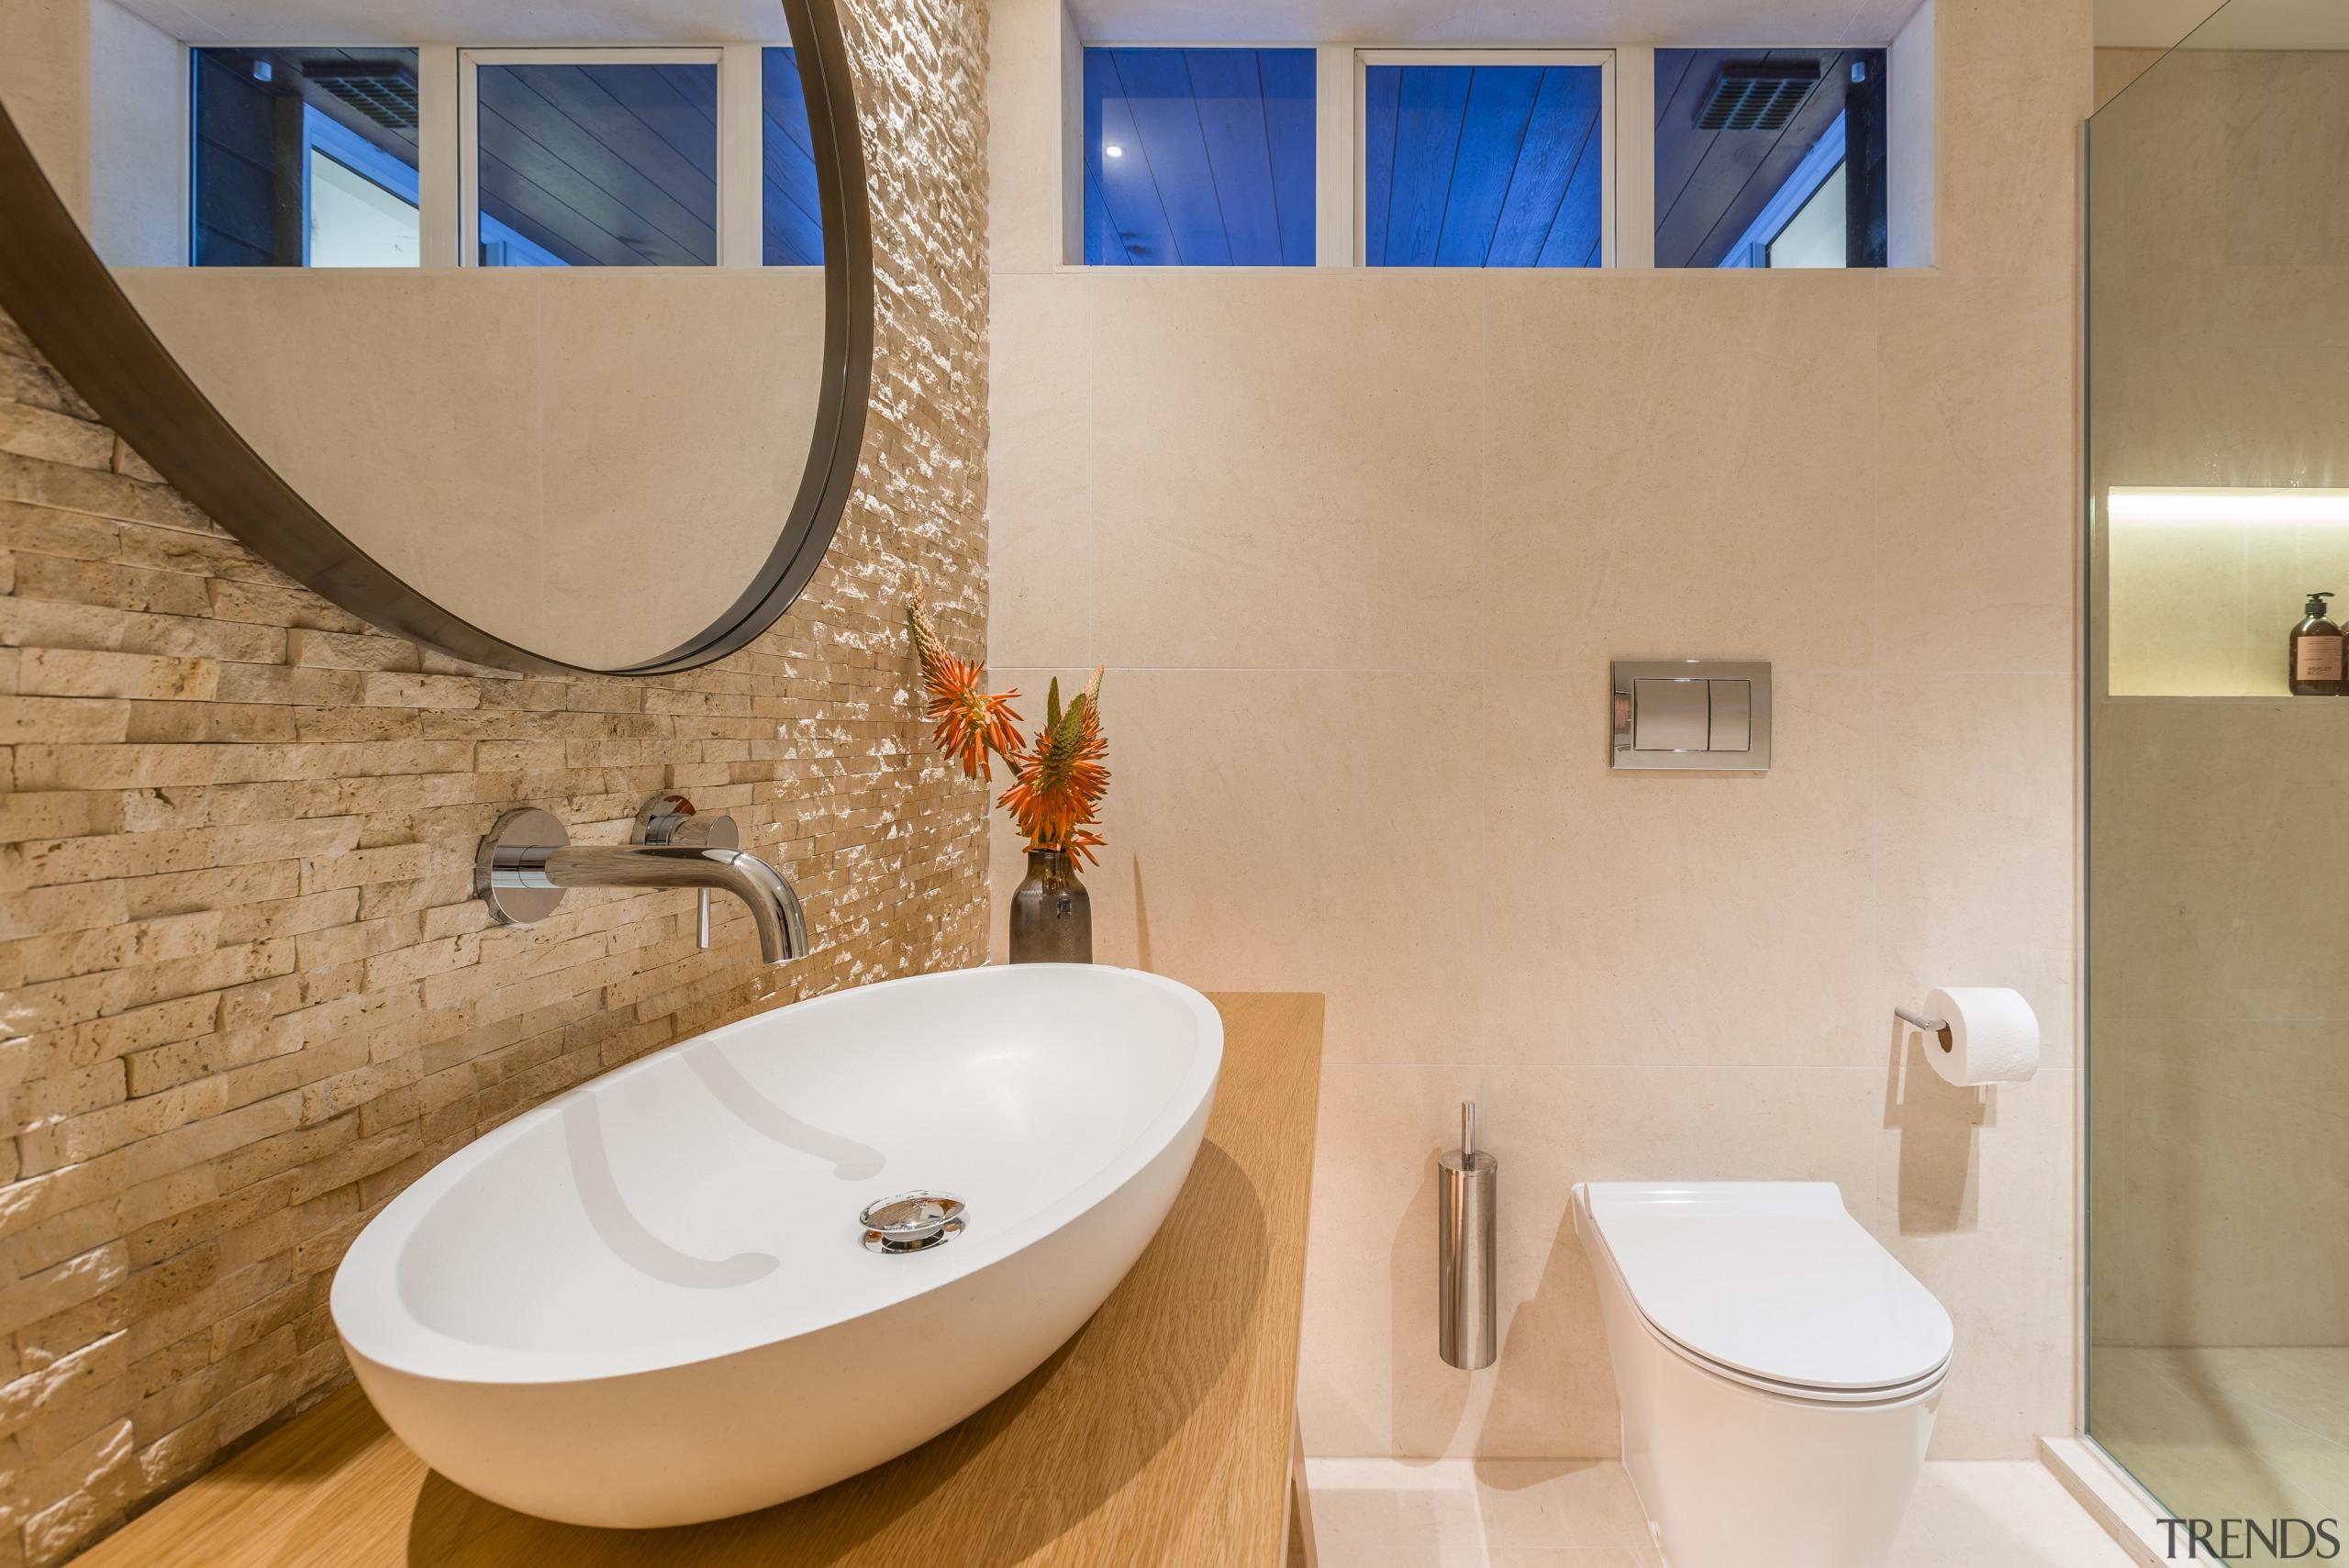 自然采光的不足通过人造光源来弥补,暖色的灯光,对氛围起到了很好的烘托作用。 bathroom, ceramic, floor, interior design, plumbing fixture, property, room, sink, tap, tile, toilet seat, orange, gray, brown